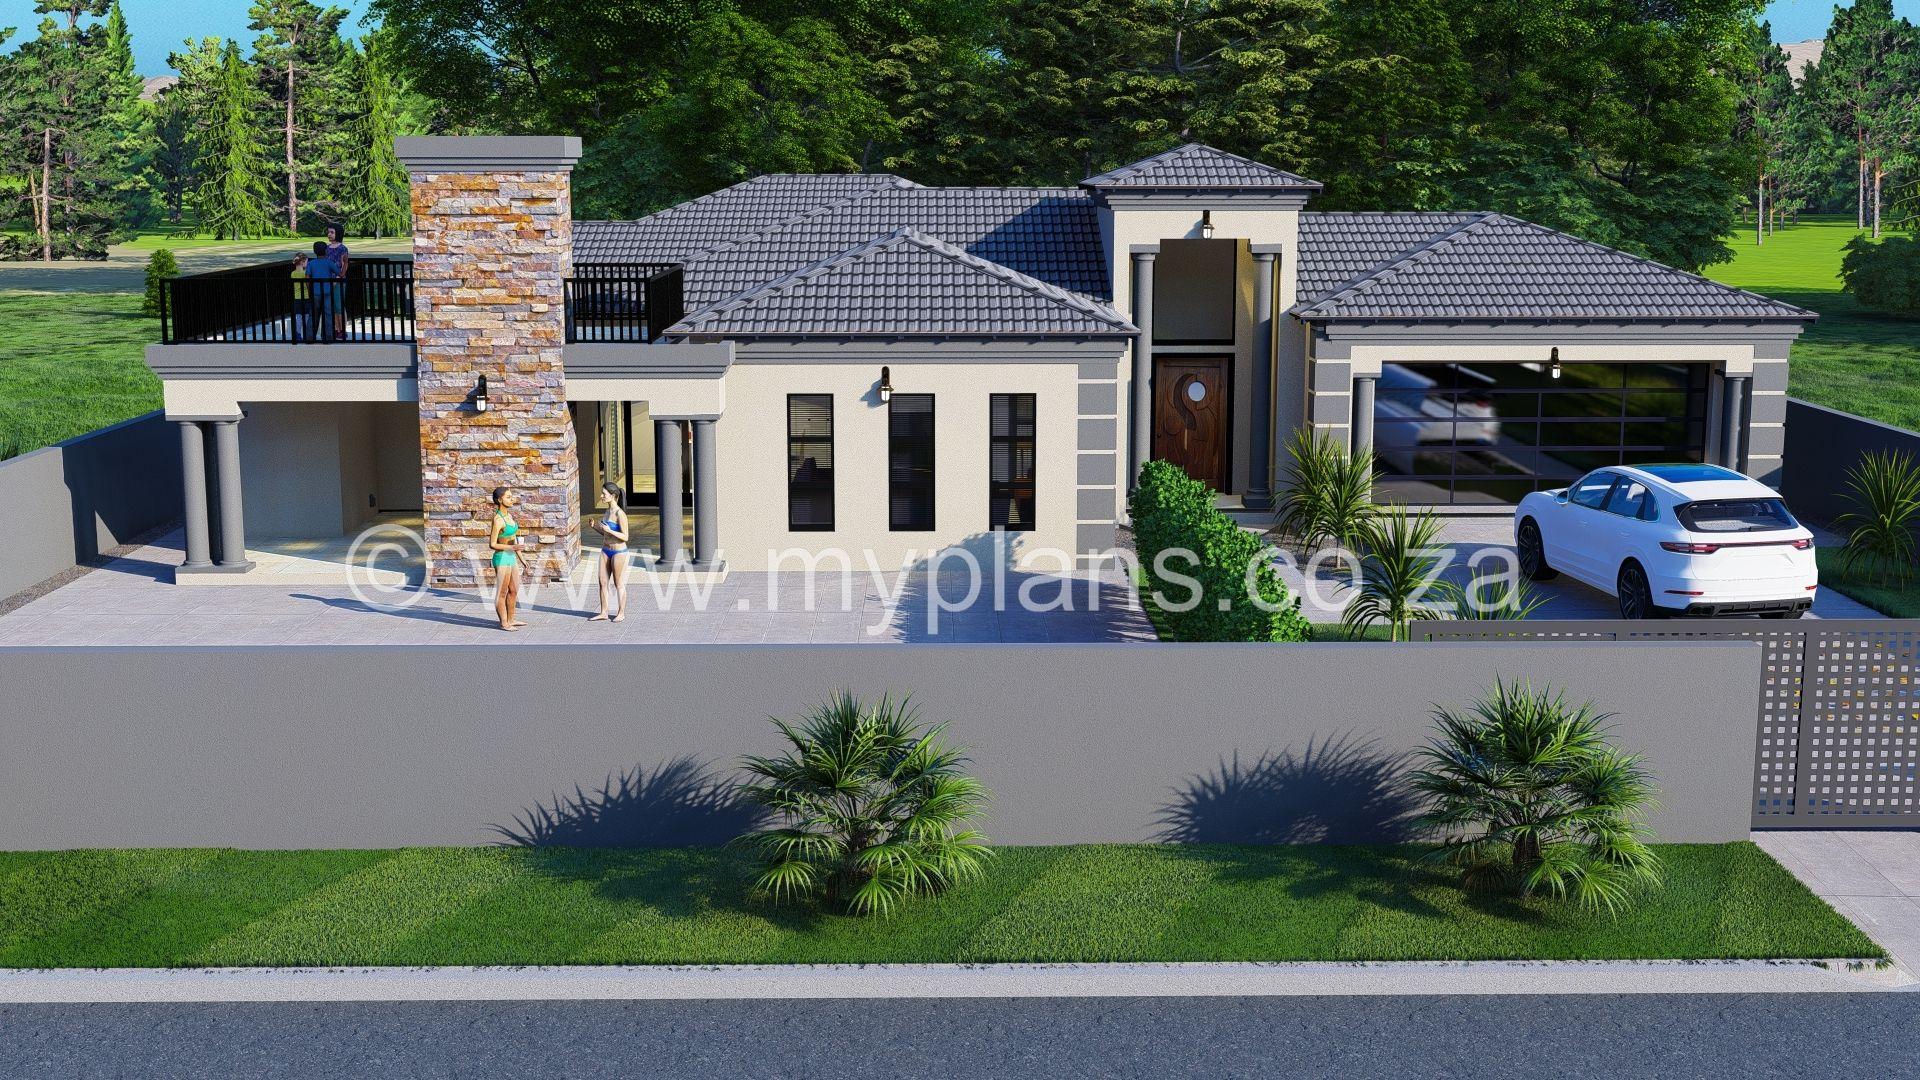 4 Bedroom House Plan Bla 021 10s 4 Bedroom House Plans Tuscan House Plans House Plans South Africa